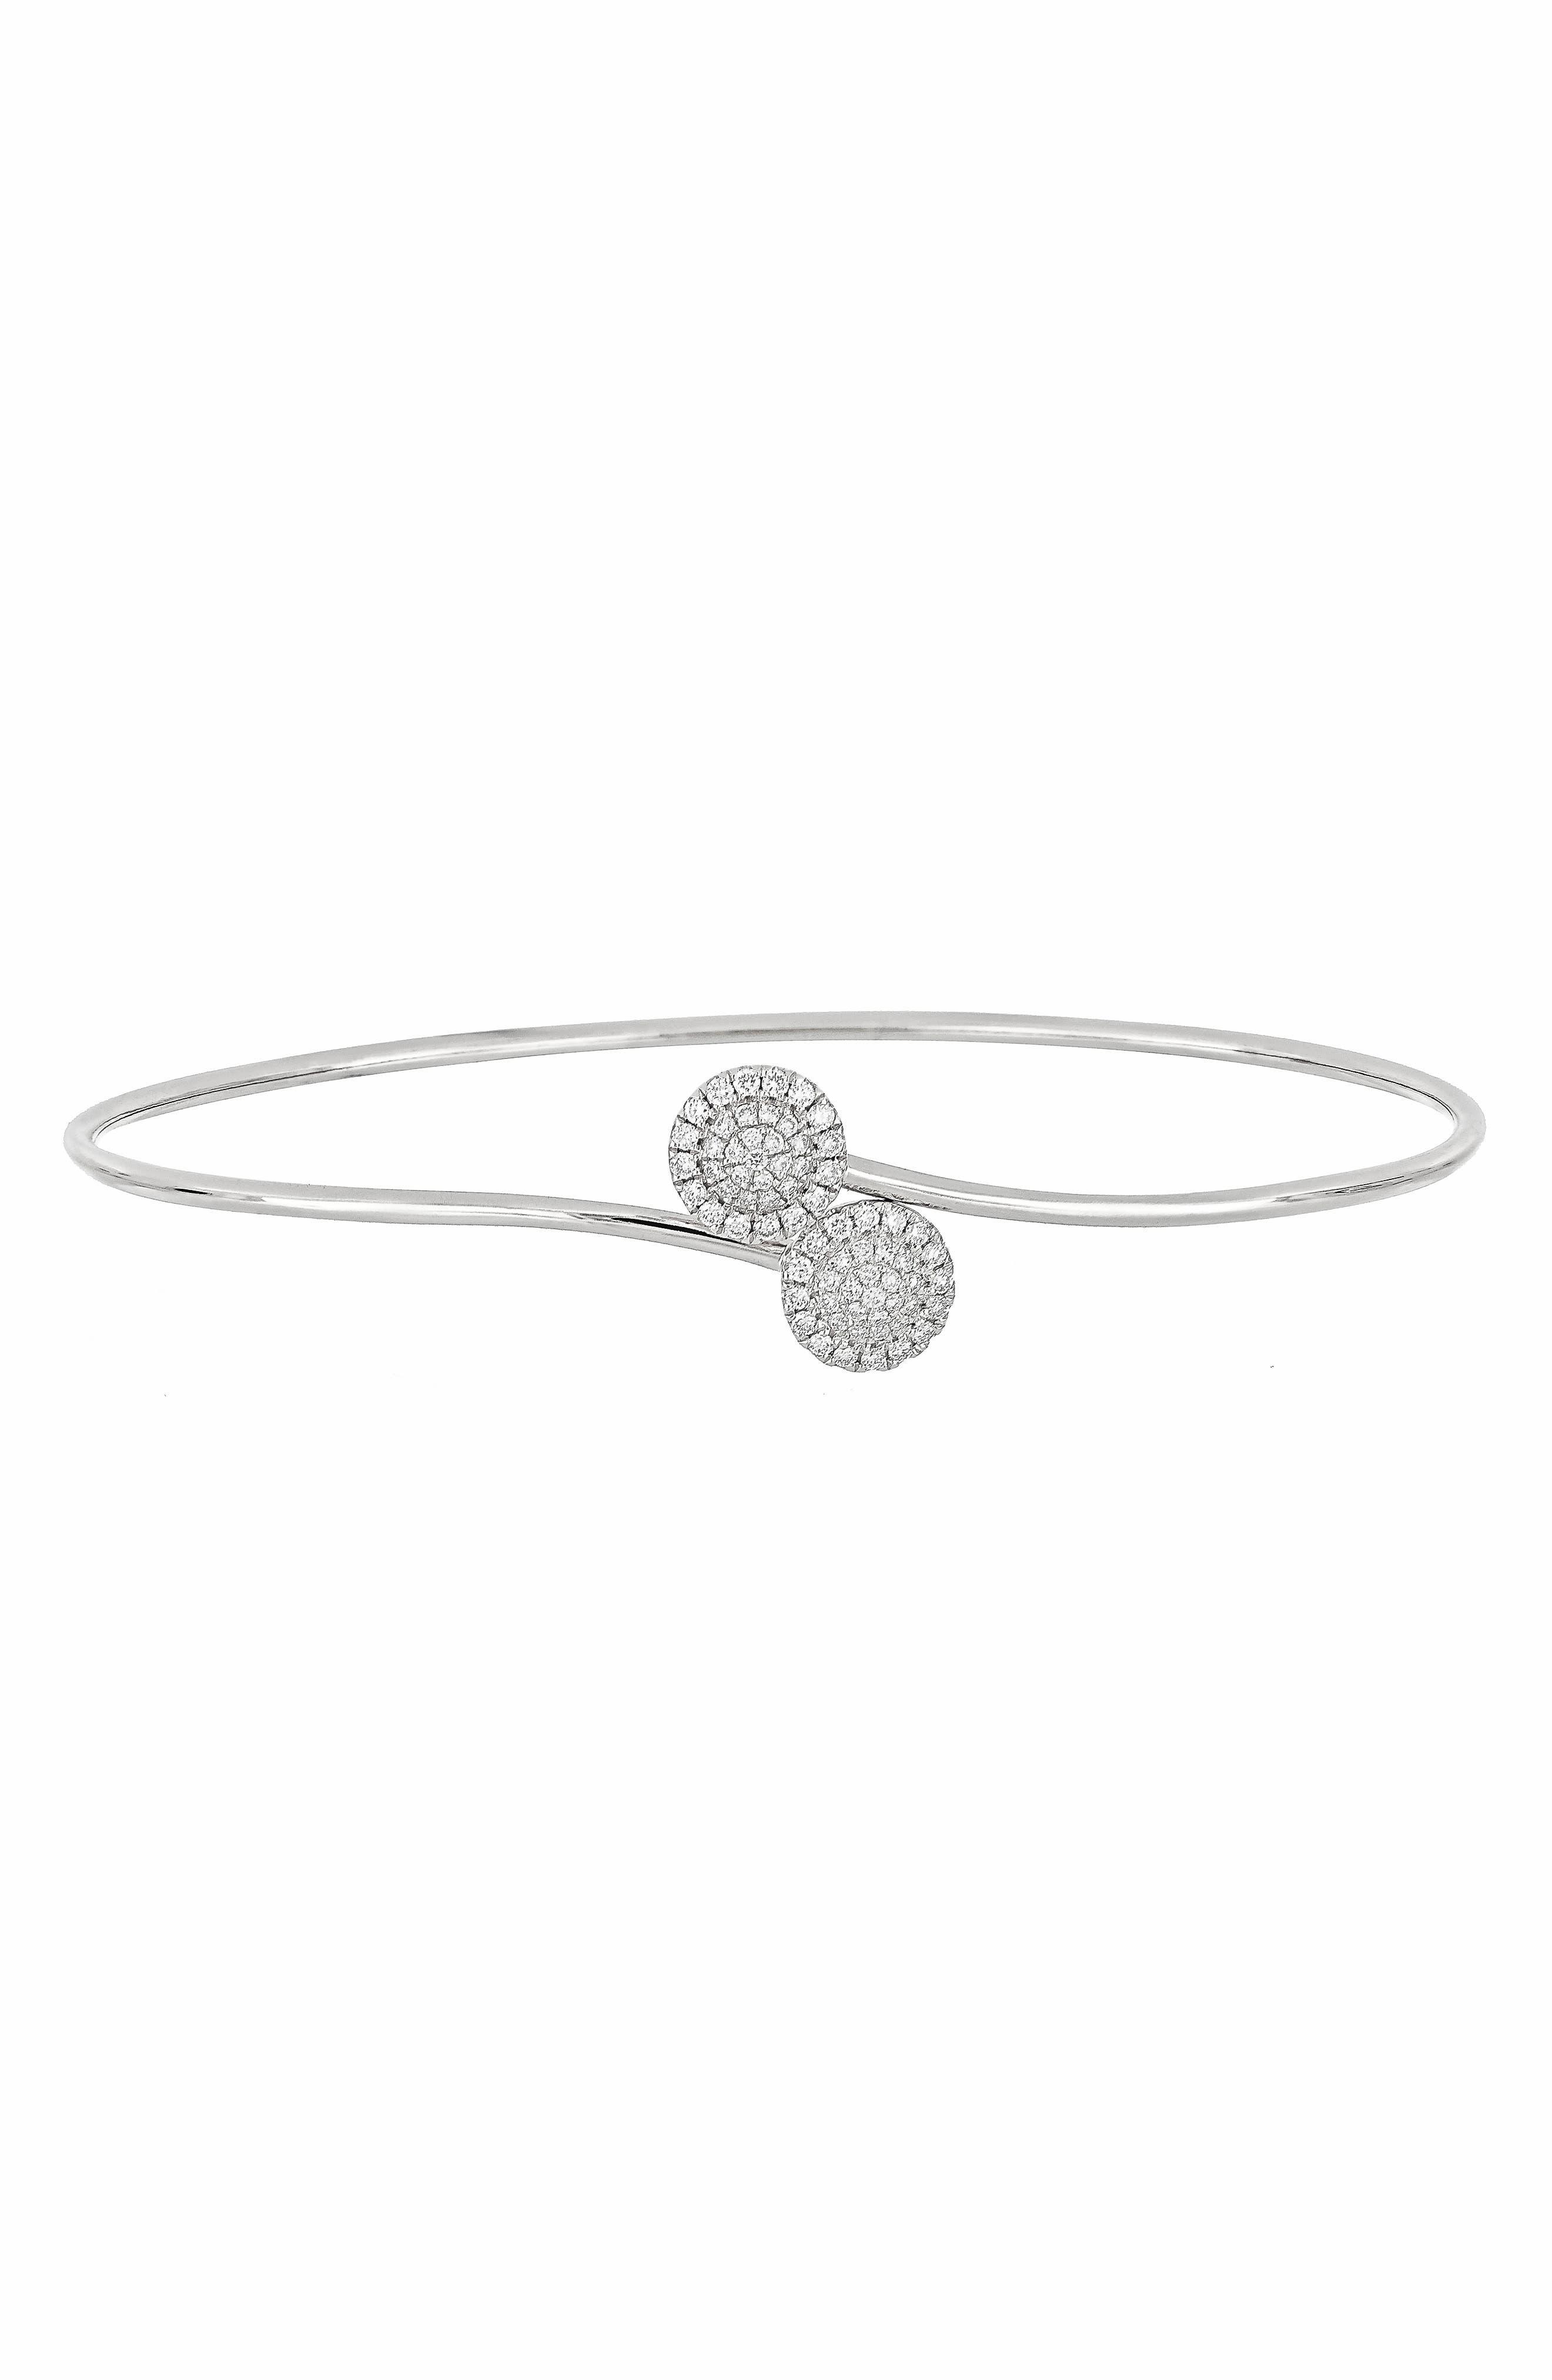 Flower Diamond Bangle,                             Main thumbnail 1, color,                             WHITE GOLD